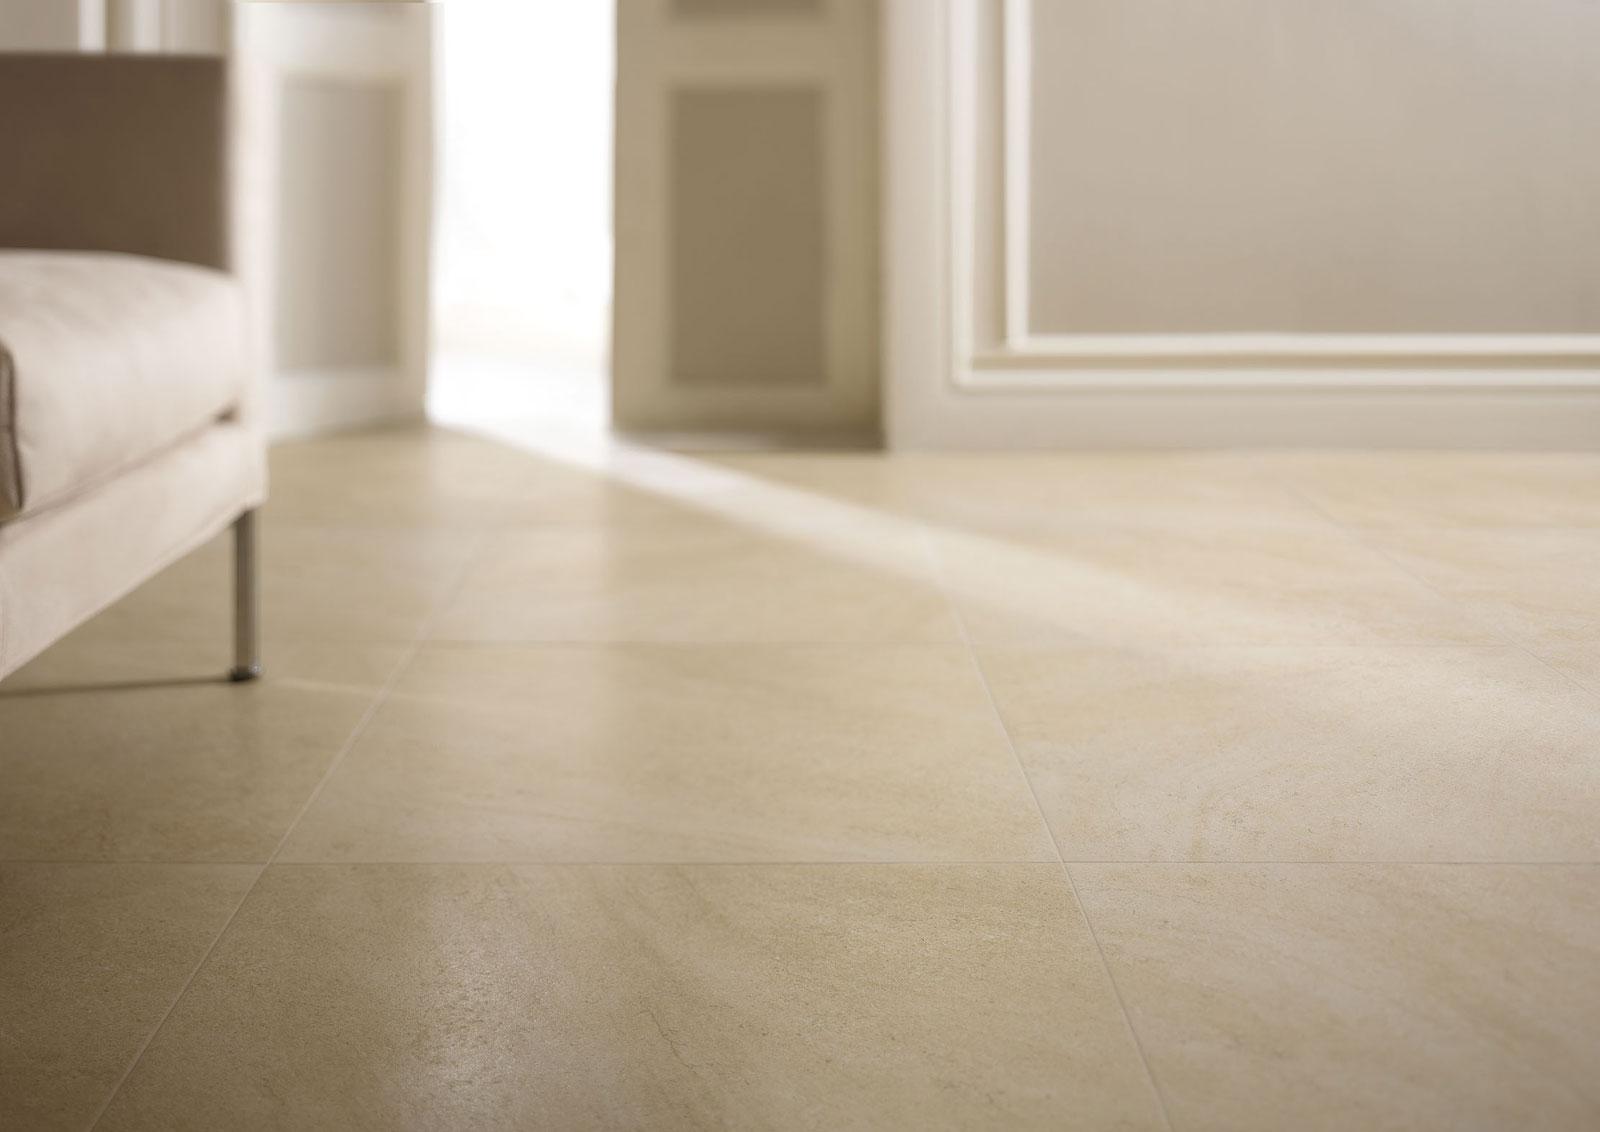 Maison gres porcellanato opaco per pavimento e rivestimento for Gres porcellanato carrelage